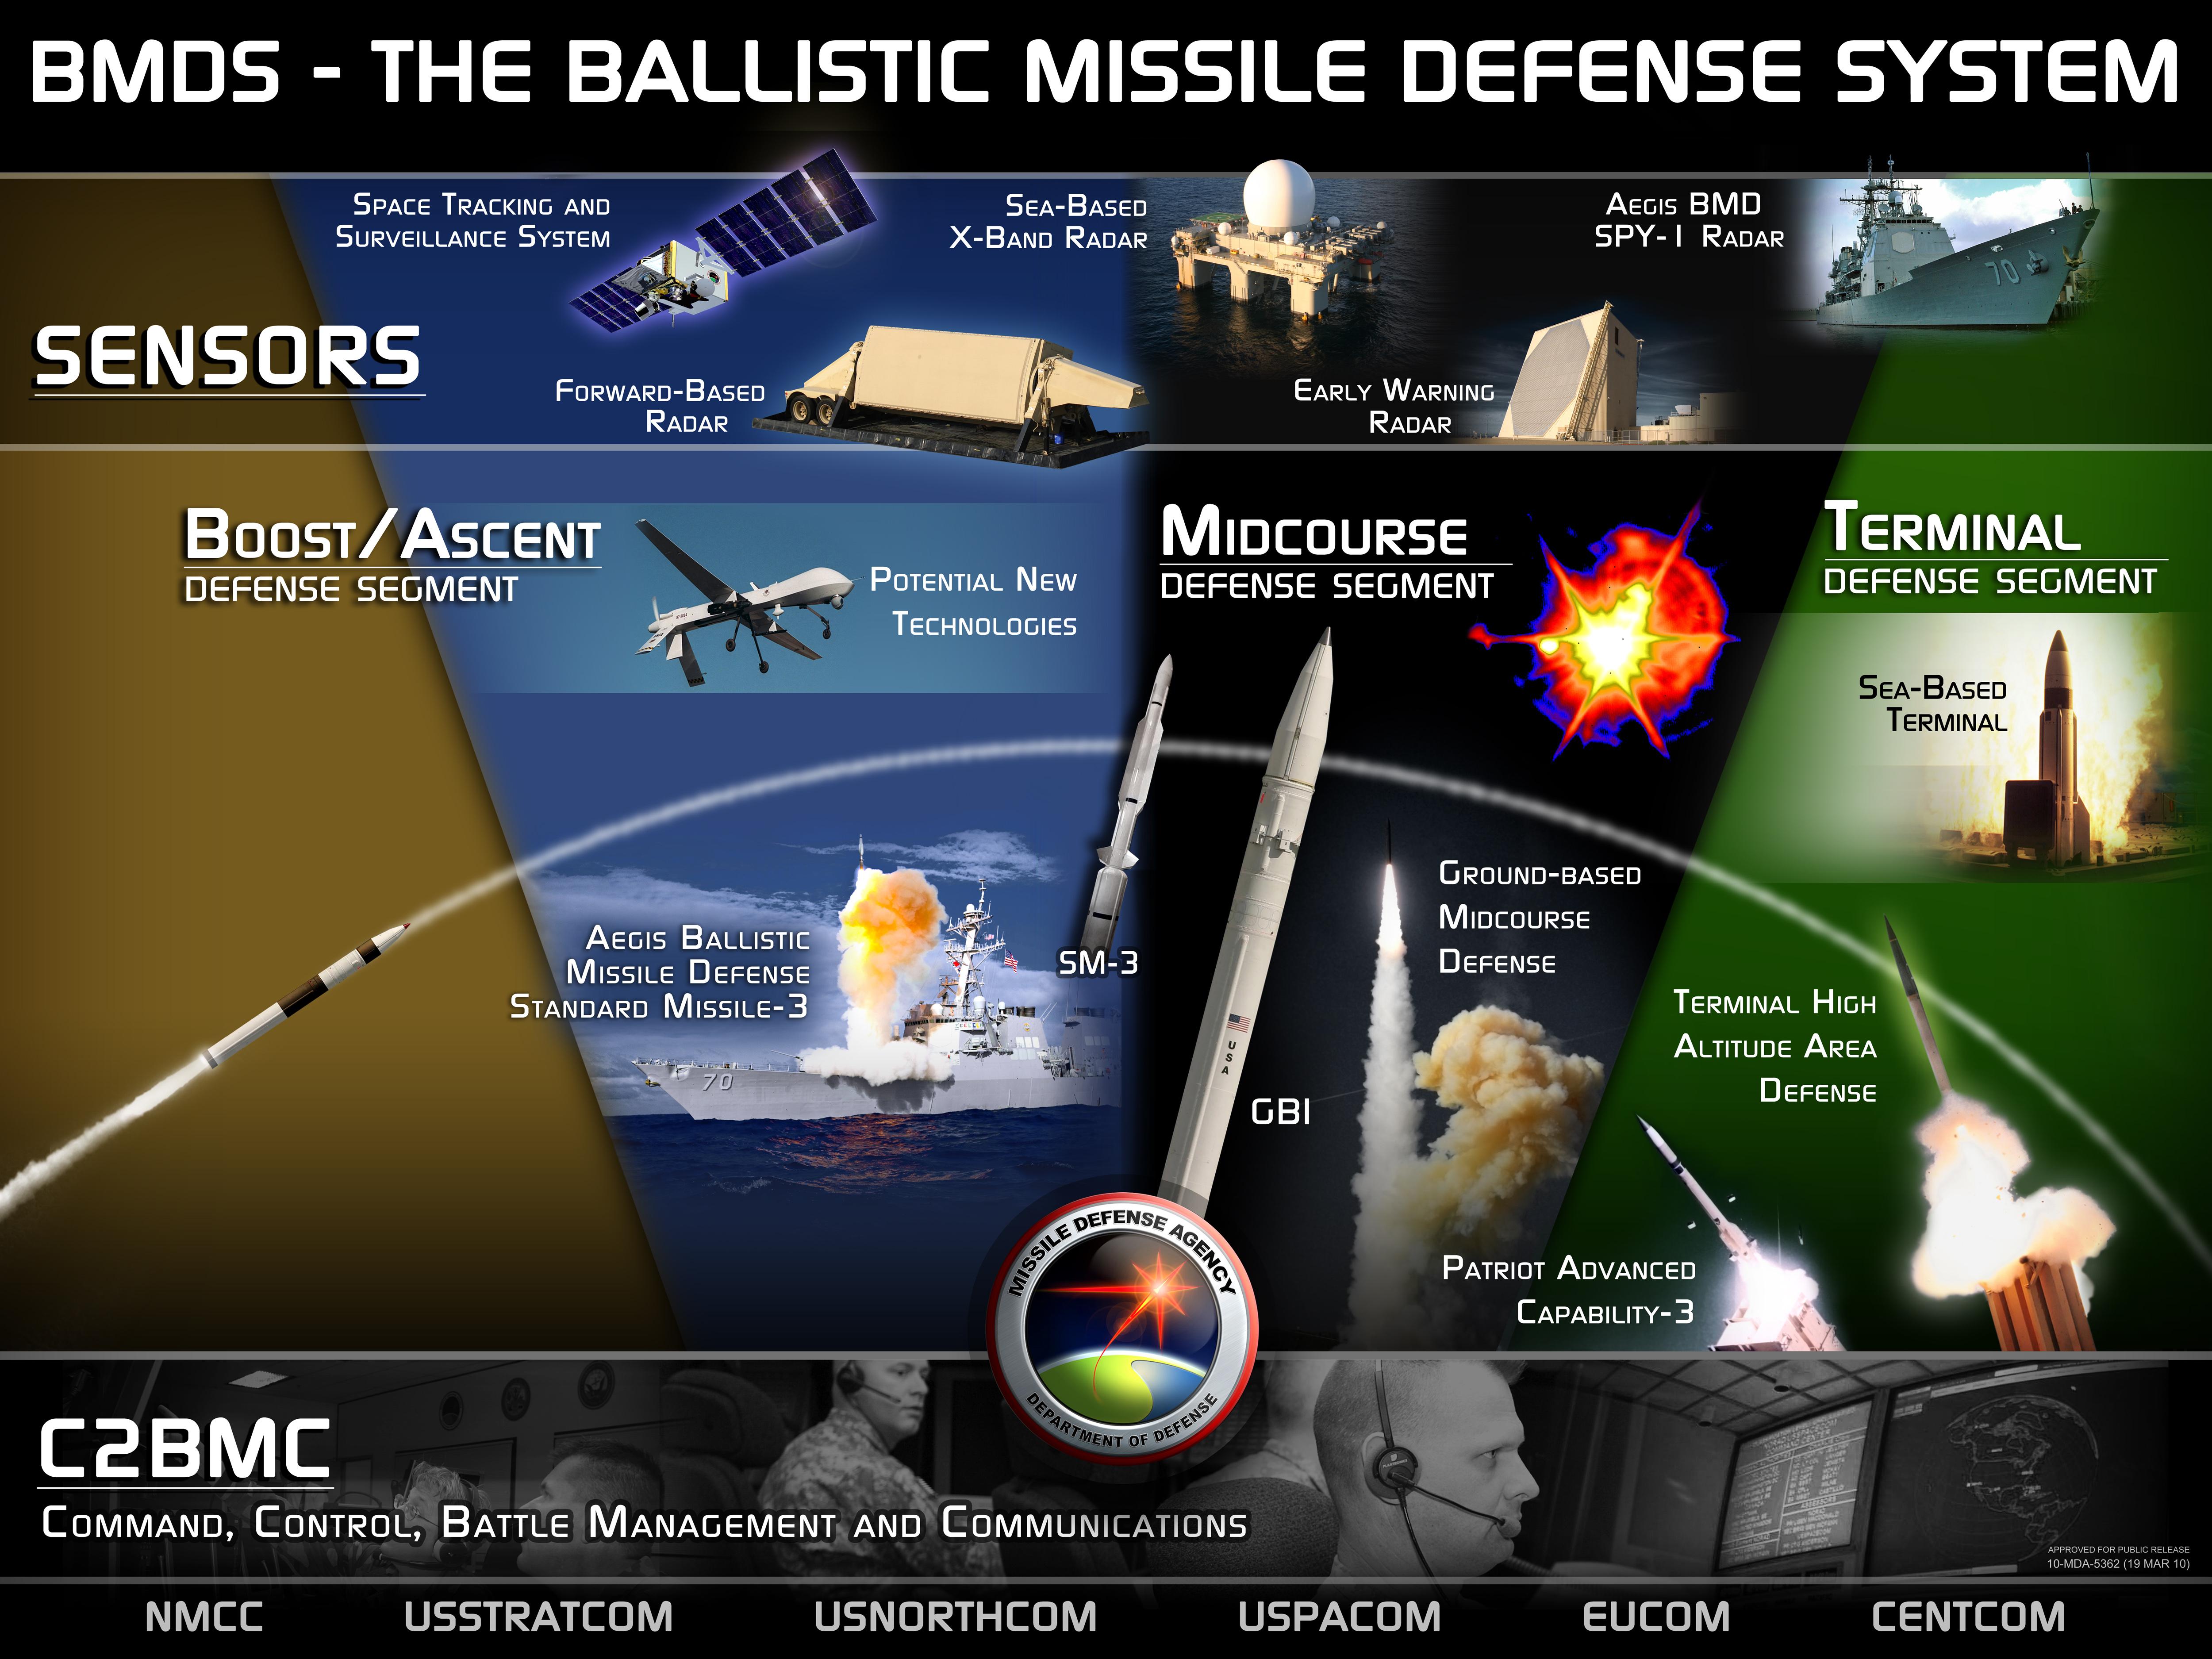 Überblick über das US-Raketenabwehrsystem